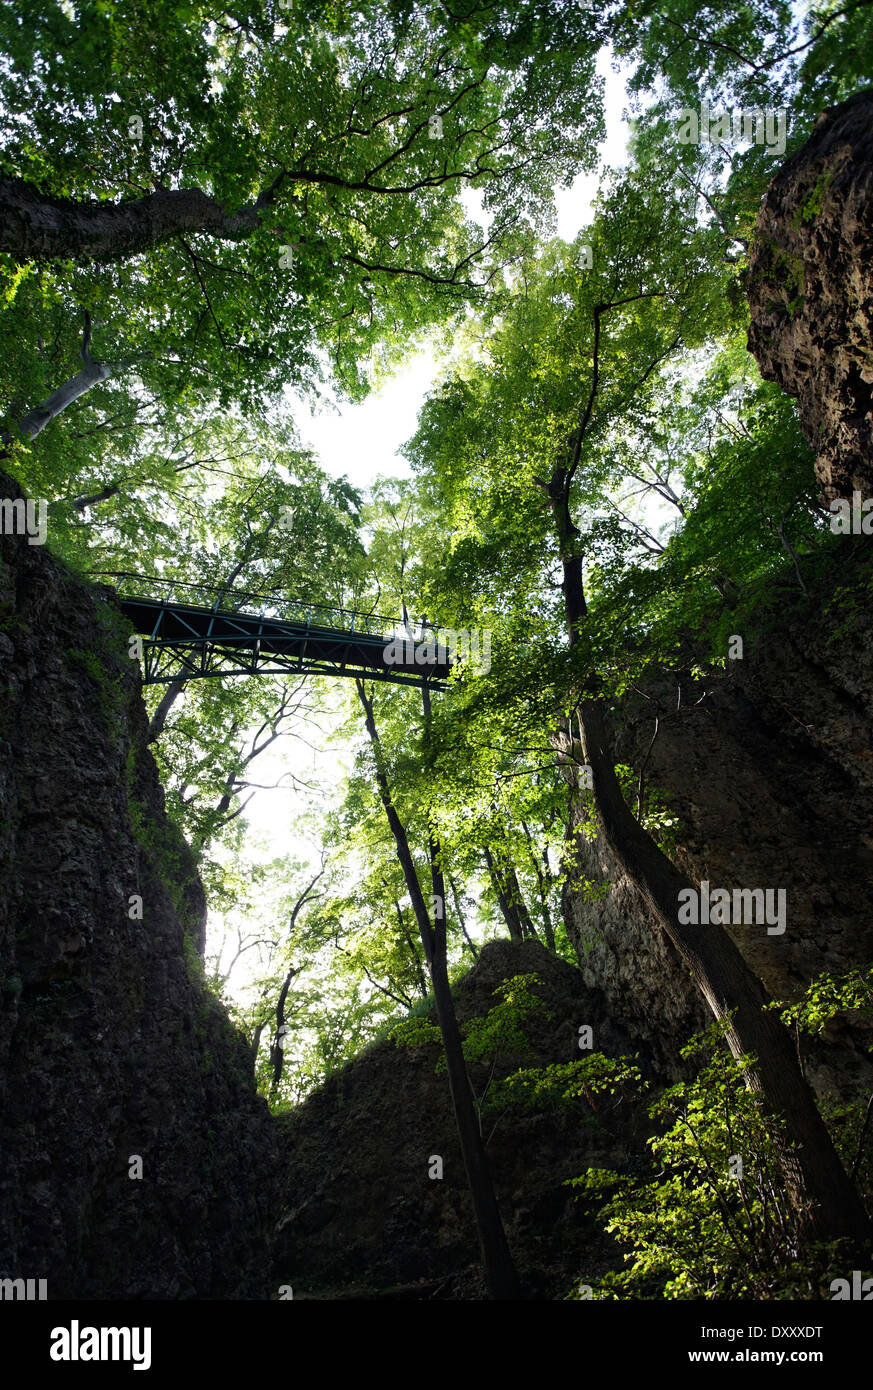 Germany, Baden-Wurttemberg, near Heubach Rosenstein castle ruins, bridge, forest, Deutschland, Baden-Württemberg, nahe Heubach, - Stock Image